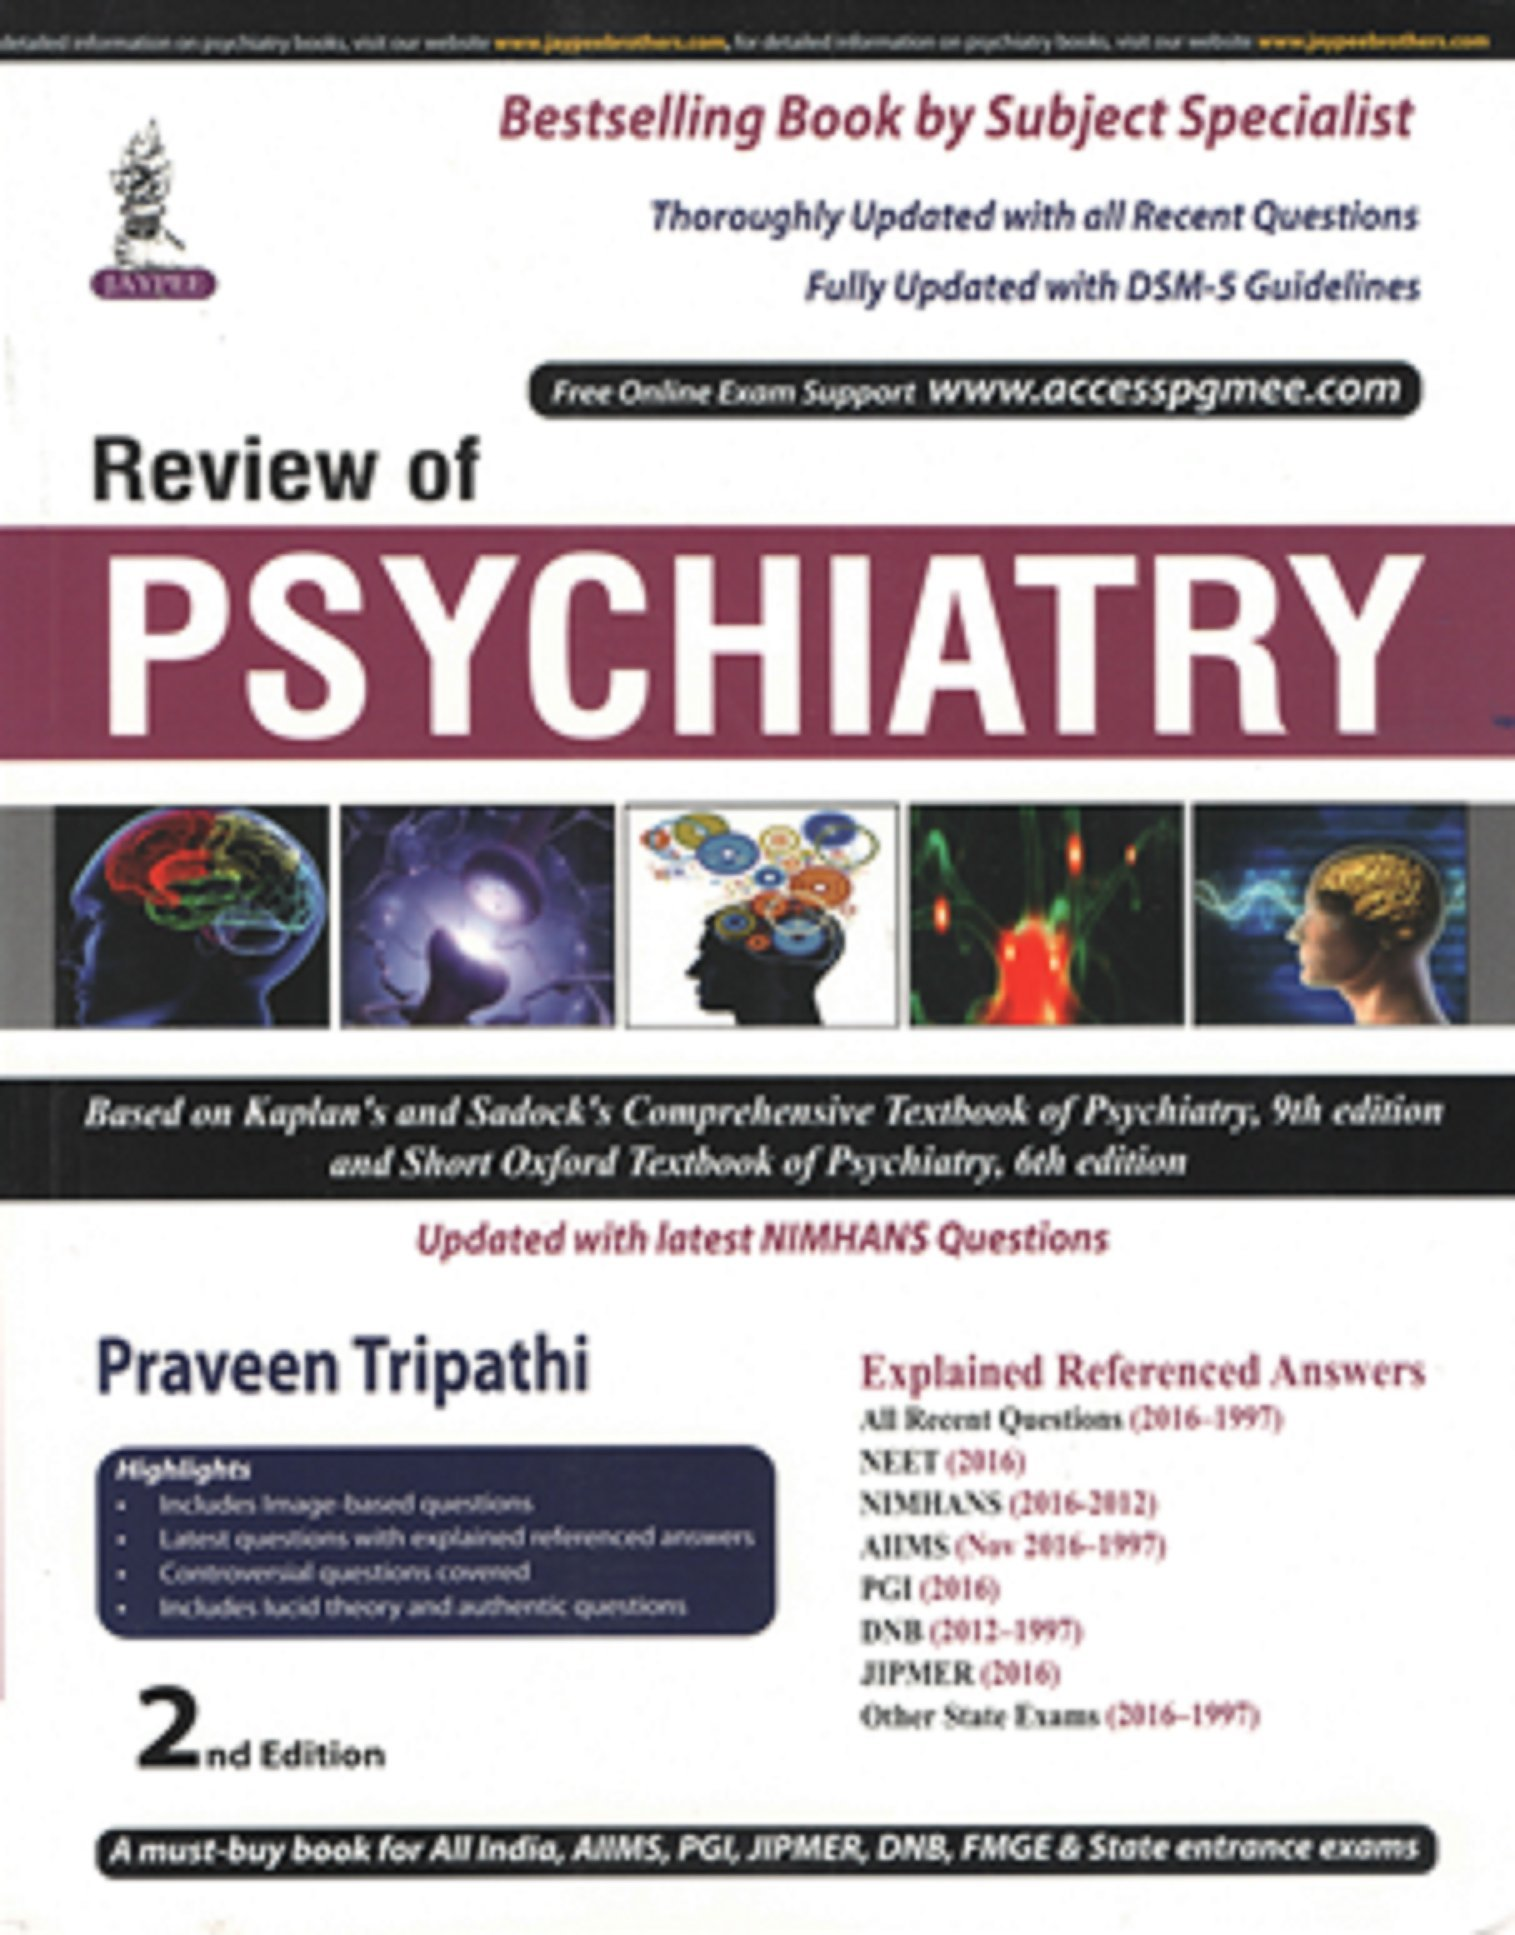 Cover letter for analytical chemist job image 7